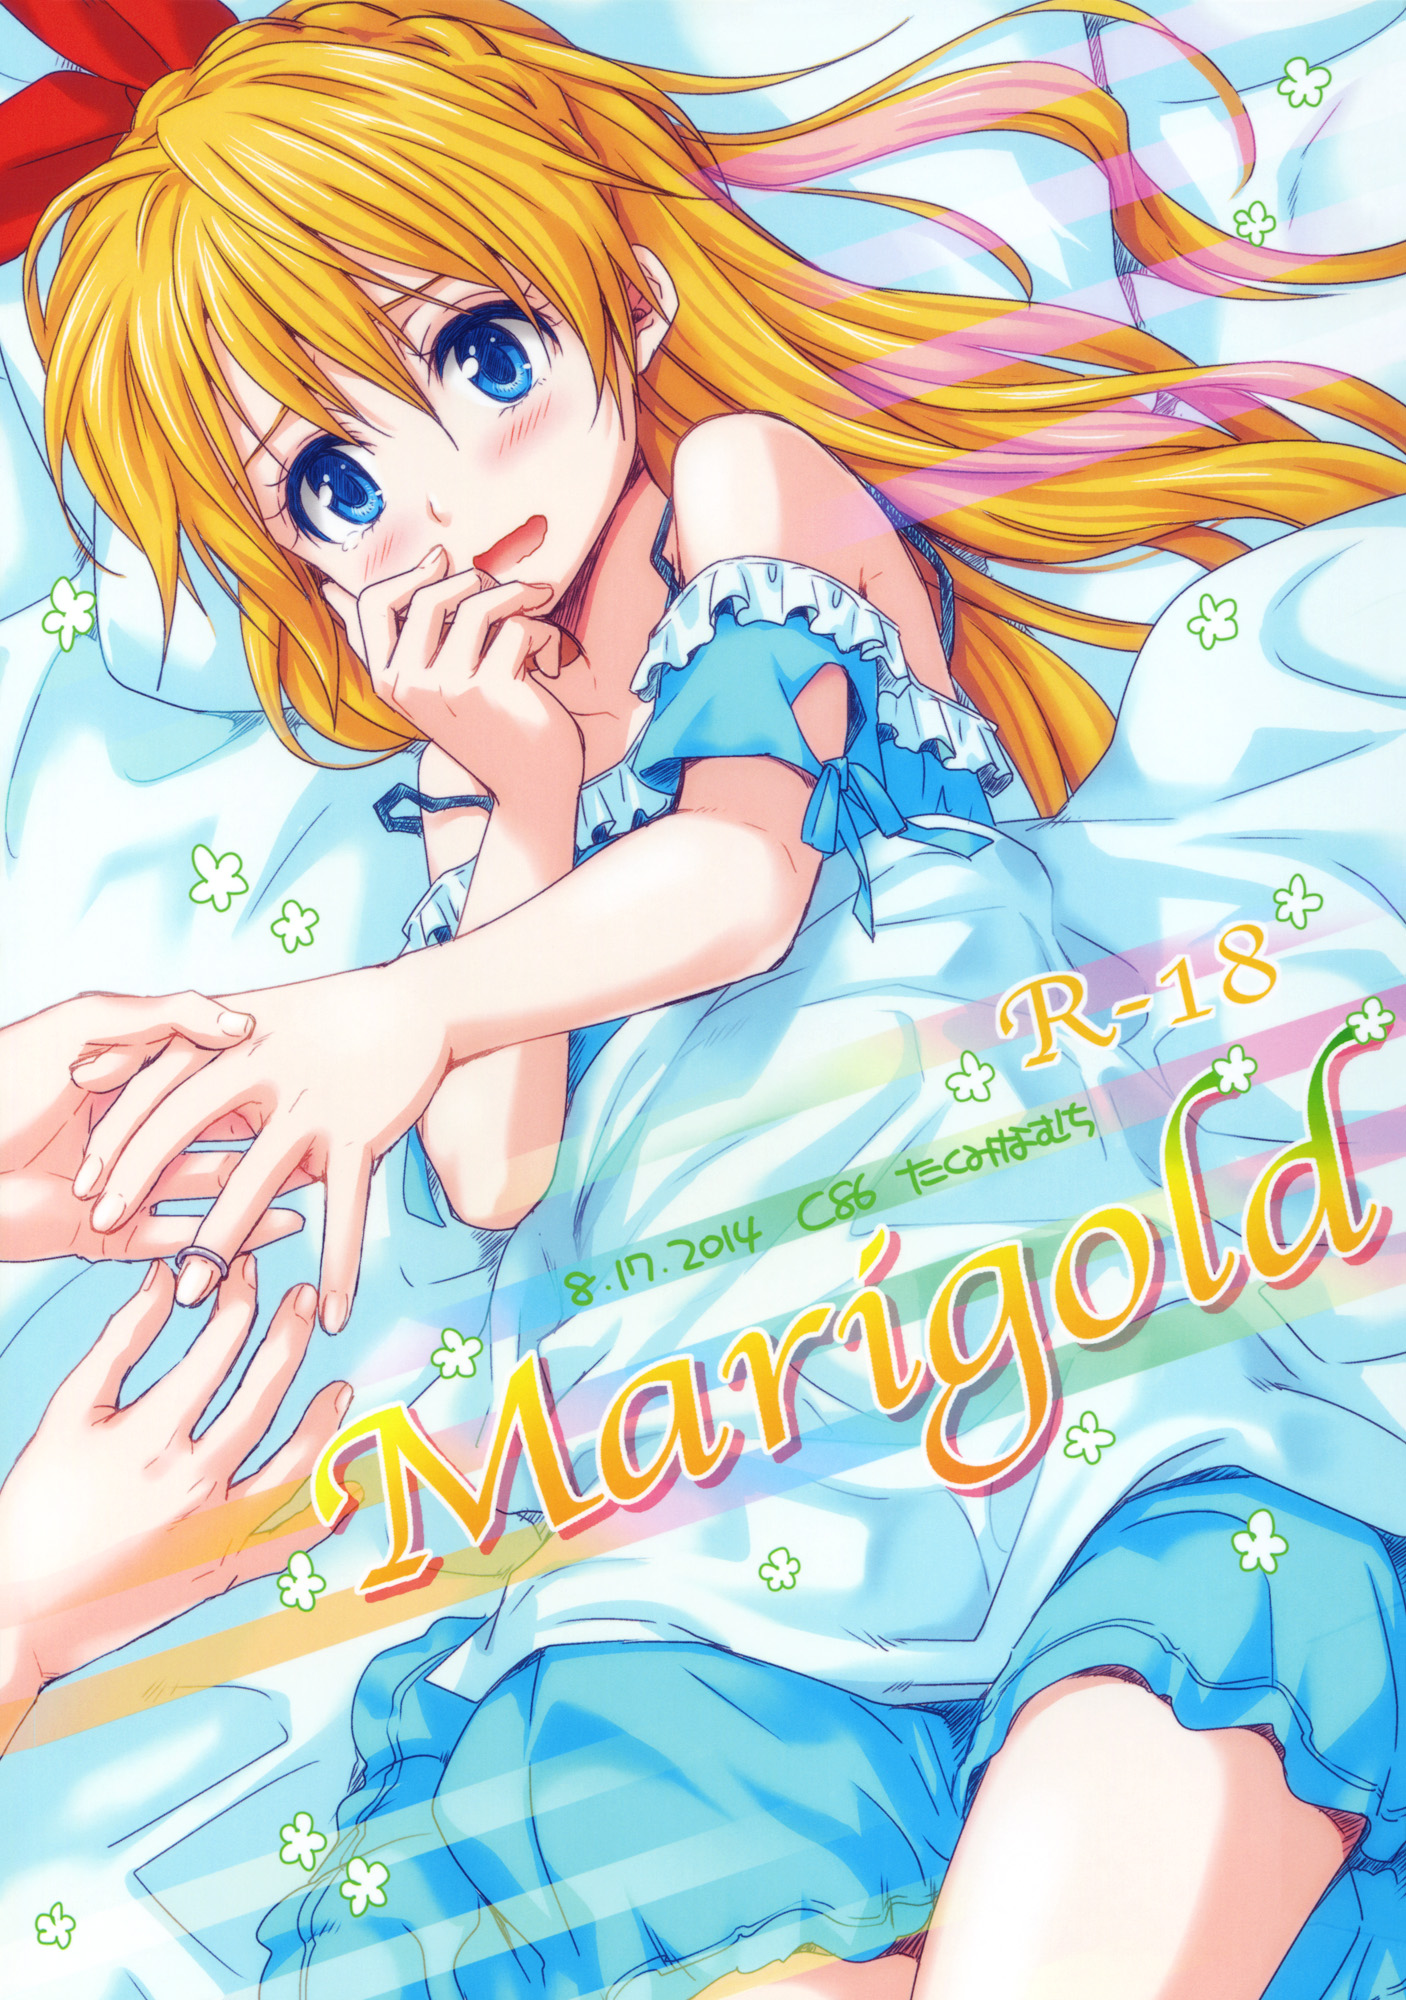 Marigold-001